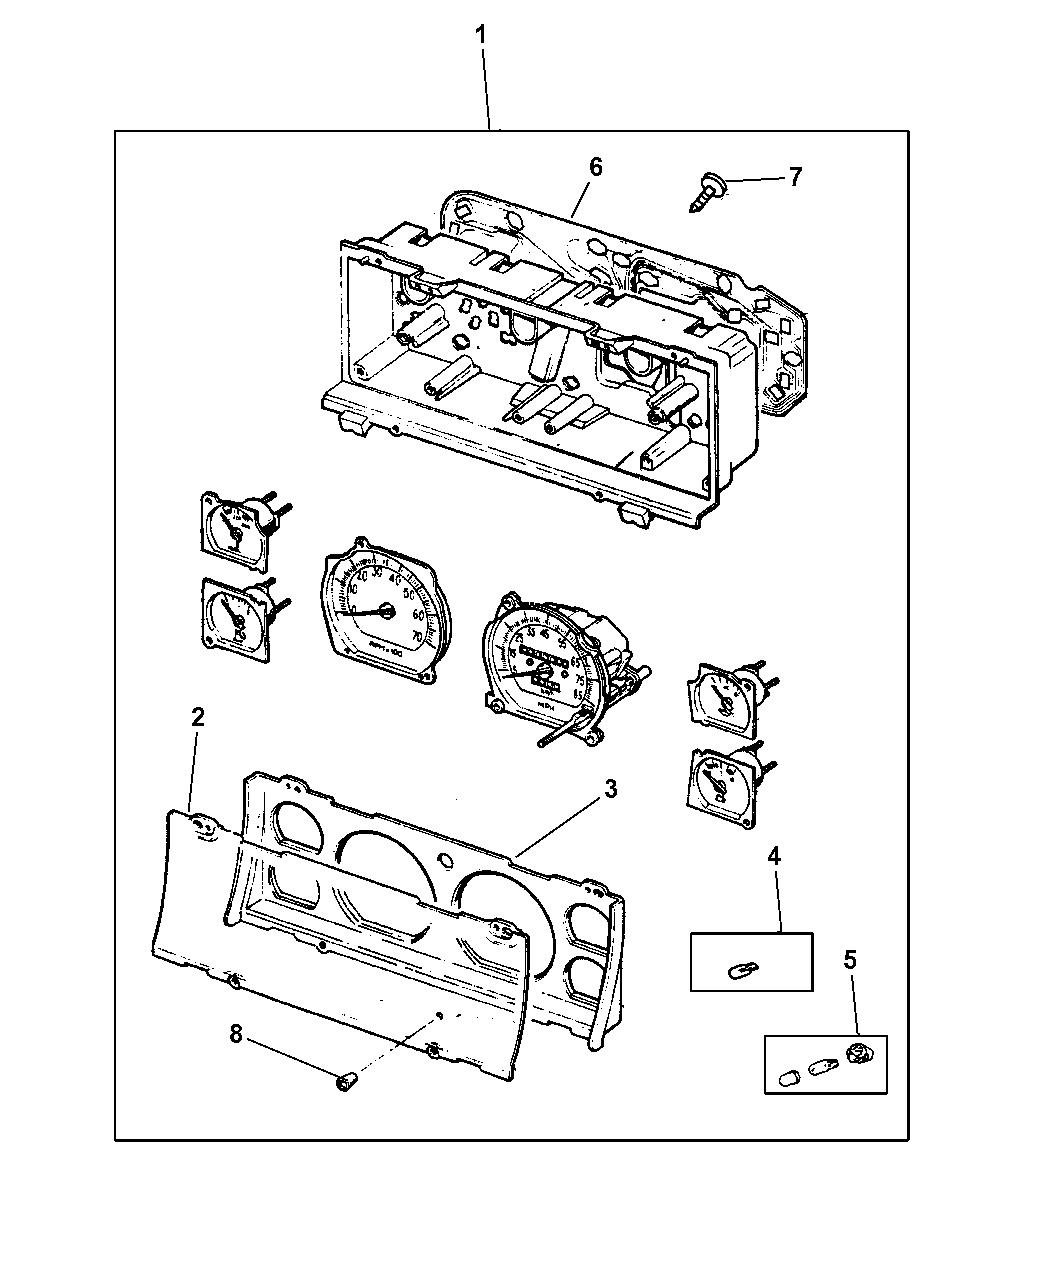 on jeep cherokee sdometer wiring diagram